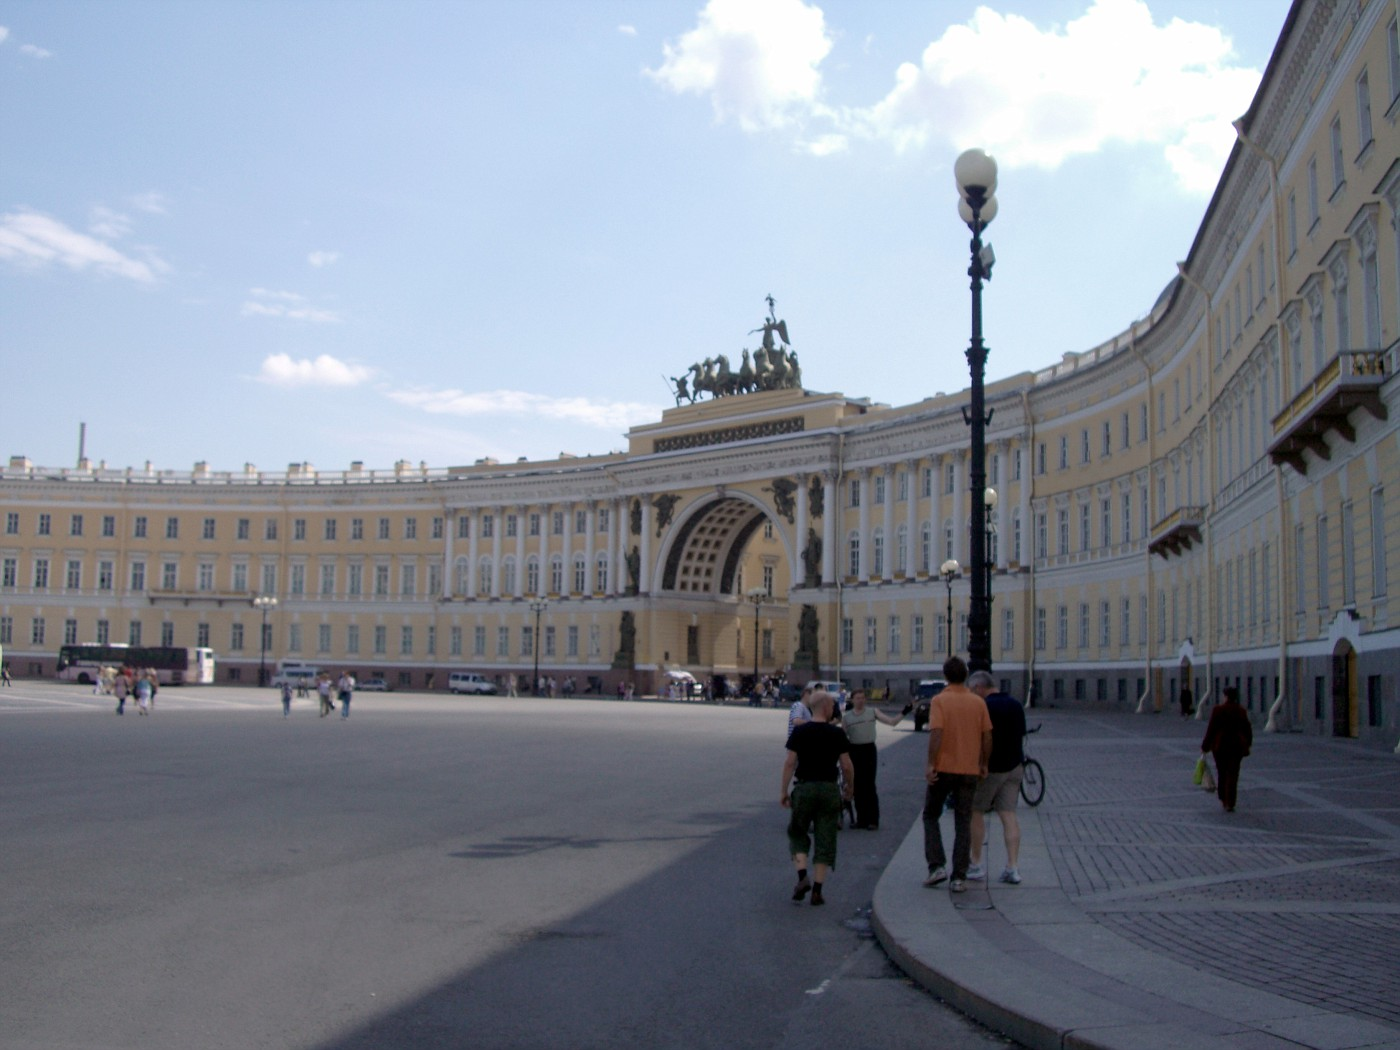 St. Petersburg, Dvorkovaya-Platz